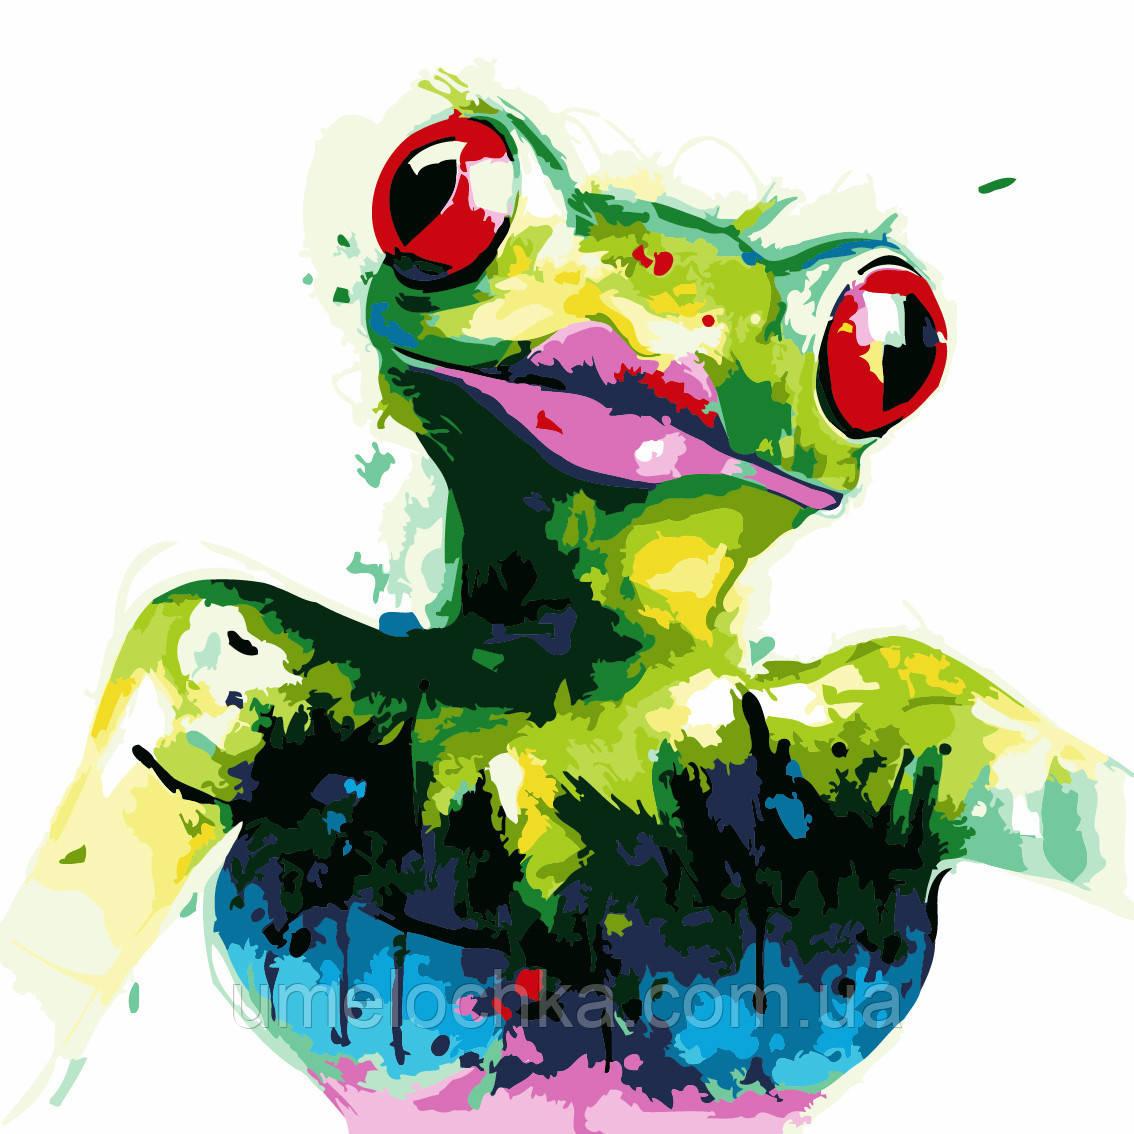 Картина раскраска Лягушка (AS0234) 40 х 40 см ArtStory [Без коробки]